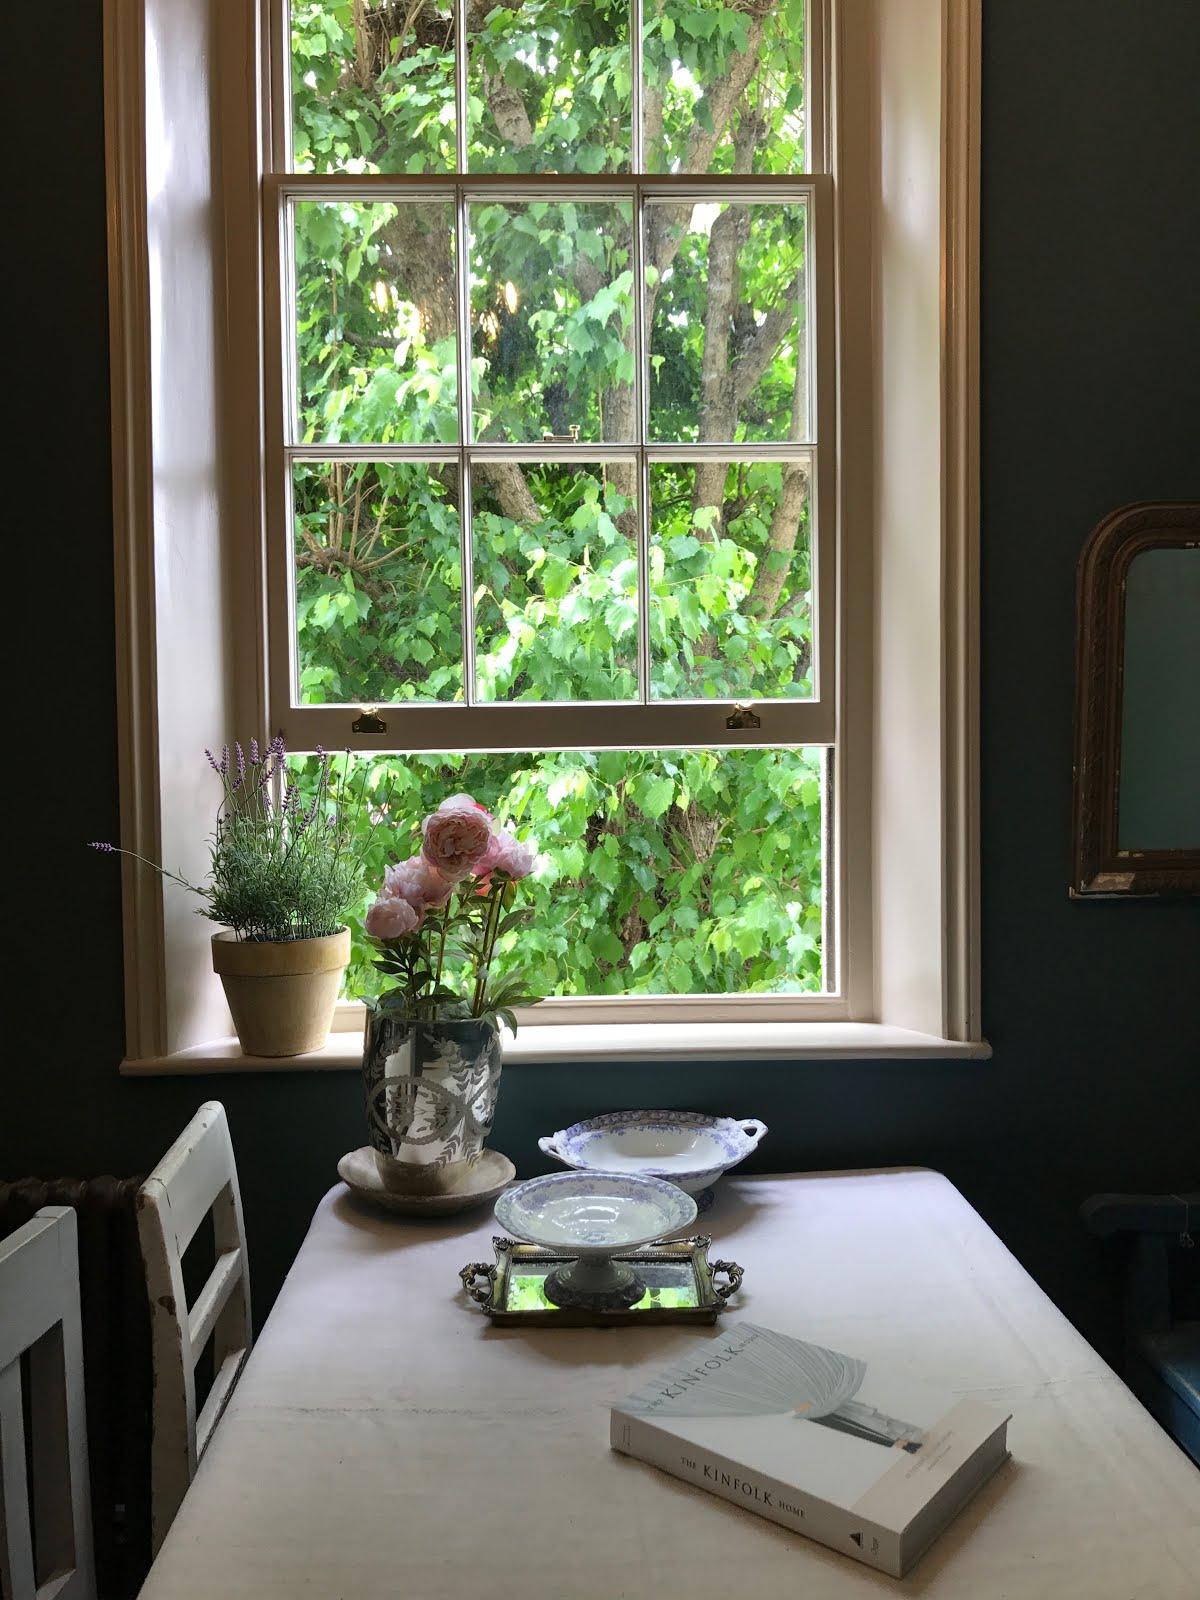 deVol Kitchen showroom, interiors blogger, a quiet style, simple moment